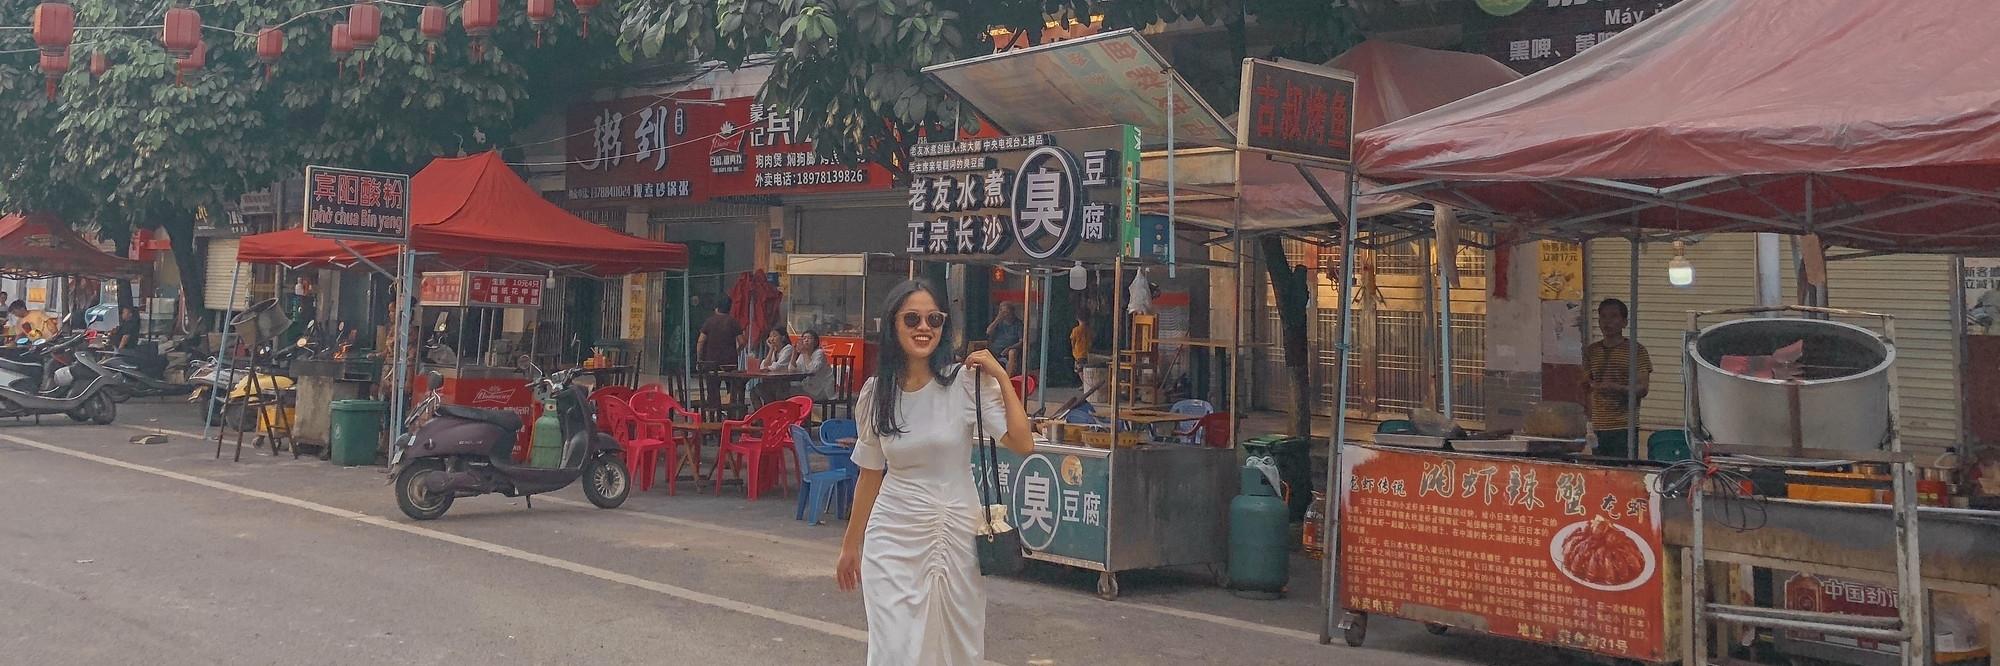 https://gody.vn/blog/trieu8655/post/lai-tiep-noi-su-thanh-cong-cua-hai-anh-lon-ha-khau-va-dong-hung-bang-tuong-cung-thu-vi-khong-kem-dau-nhe-5030